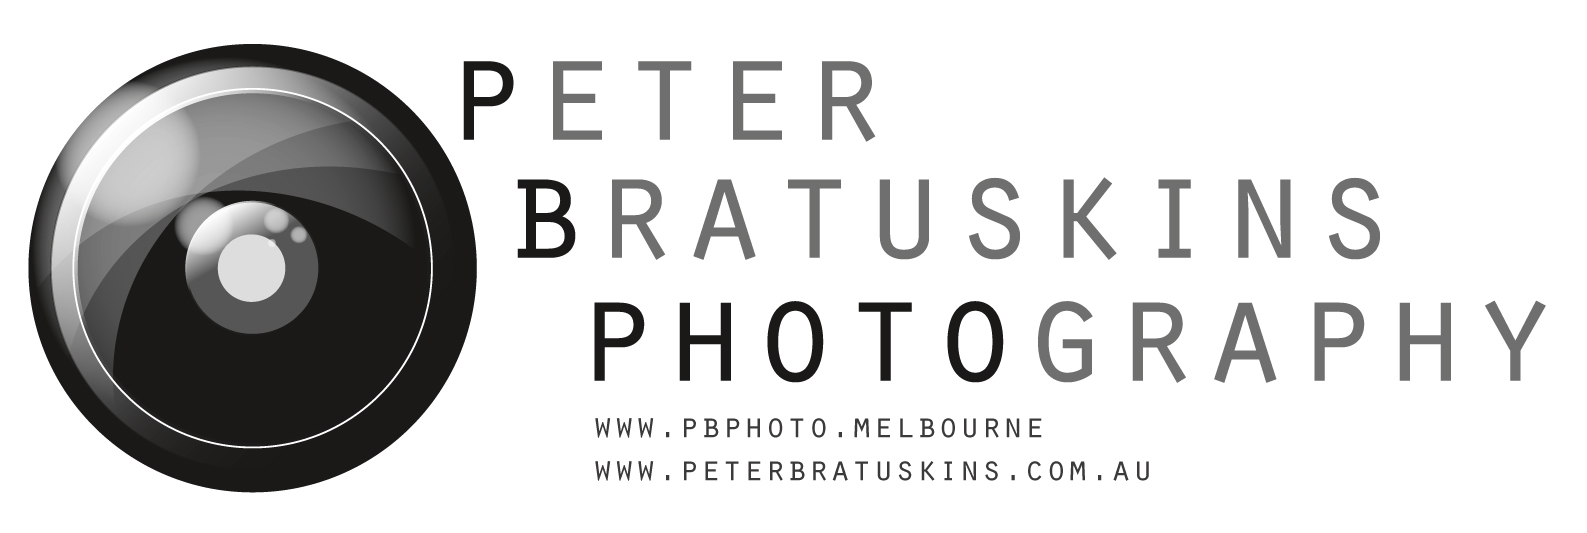 Peter Bratuskins Photography